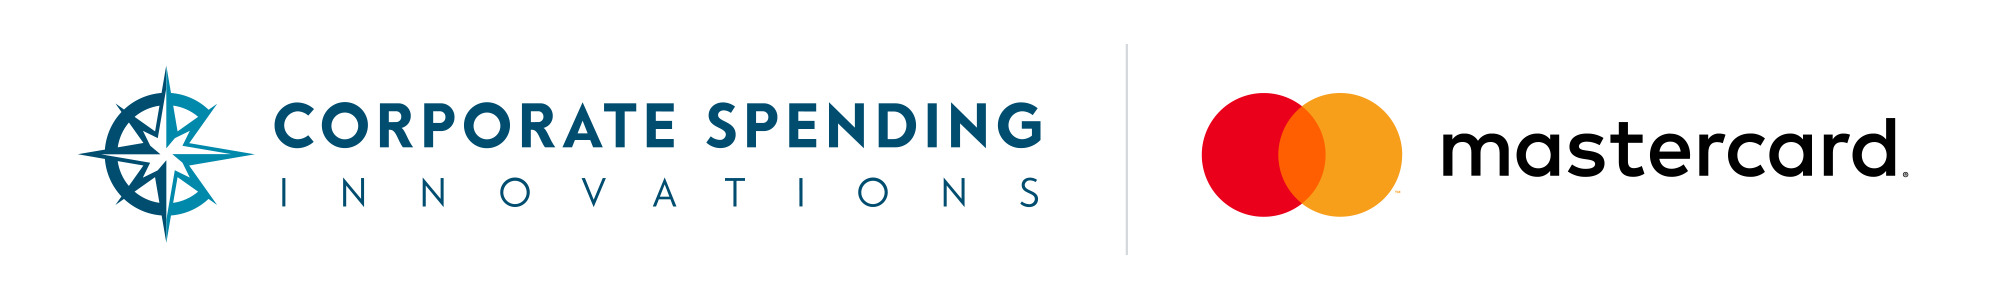 CSI - Corporate Spending Innovations